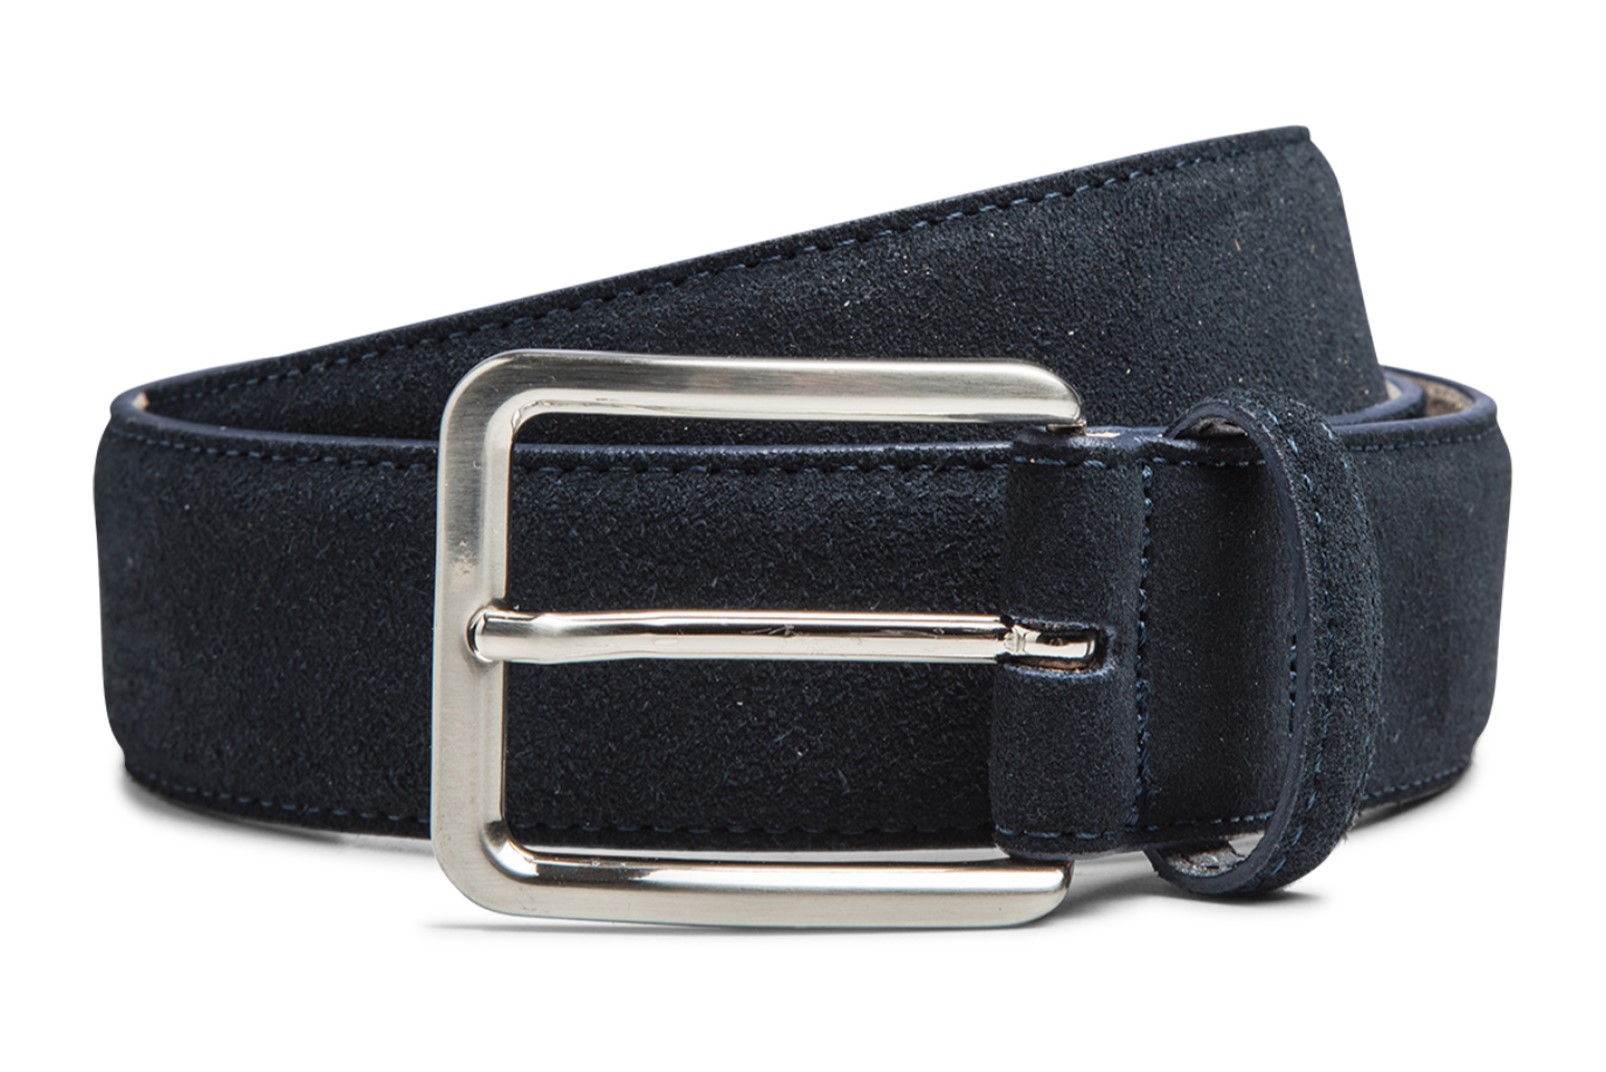 Suede belt by Boggi Milano BO17C010001